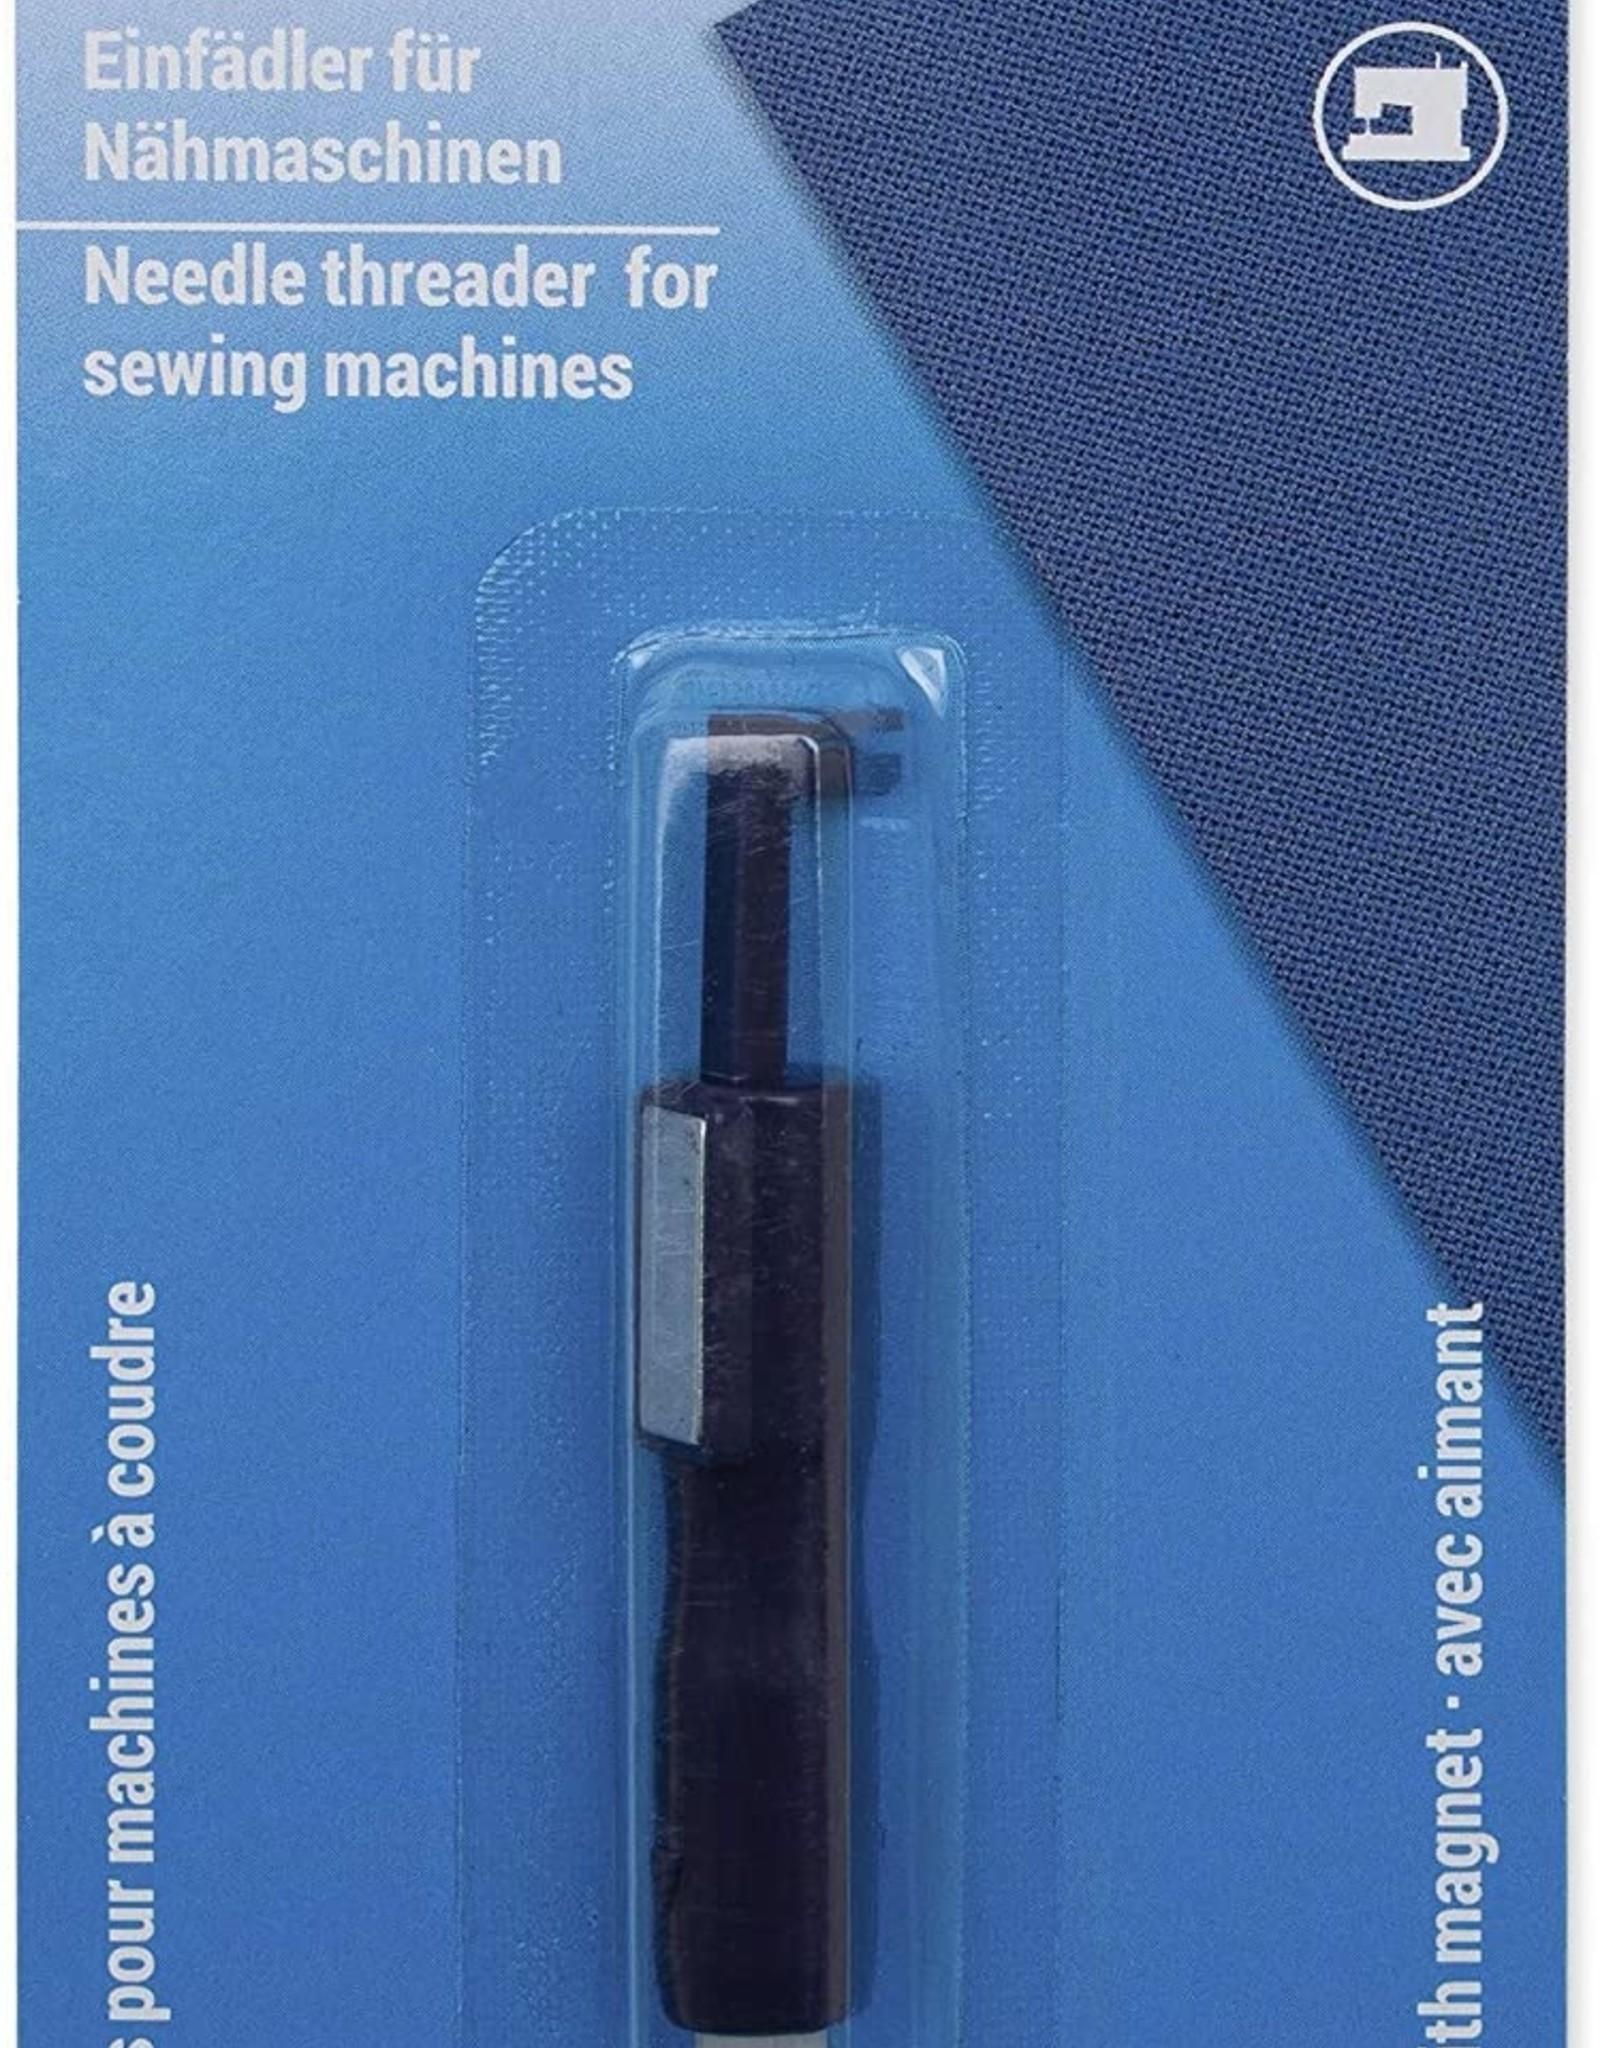 Prym Prym - draaddoorsteker voor naaimachines, met magneet- 611 126